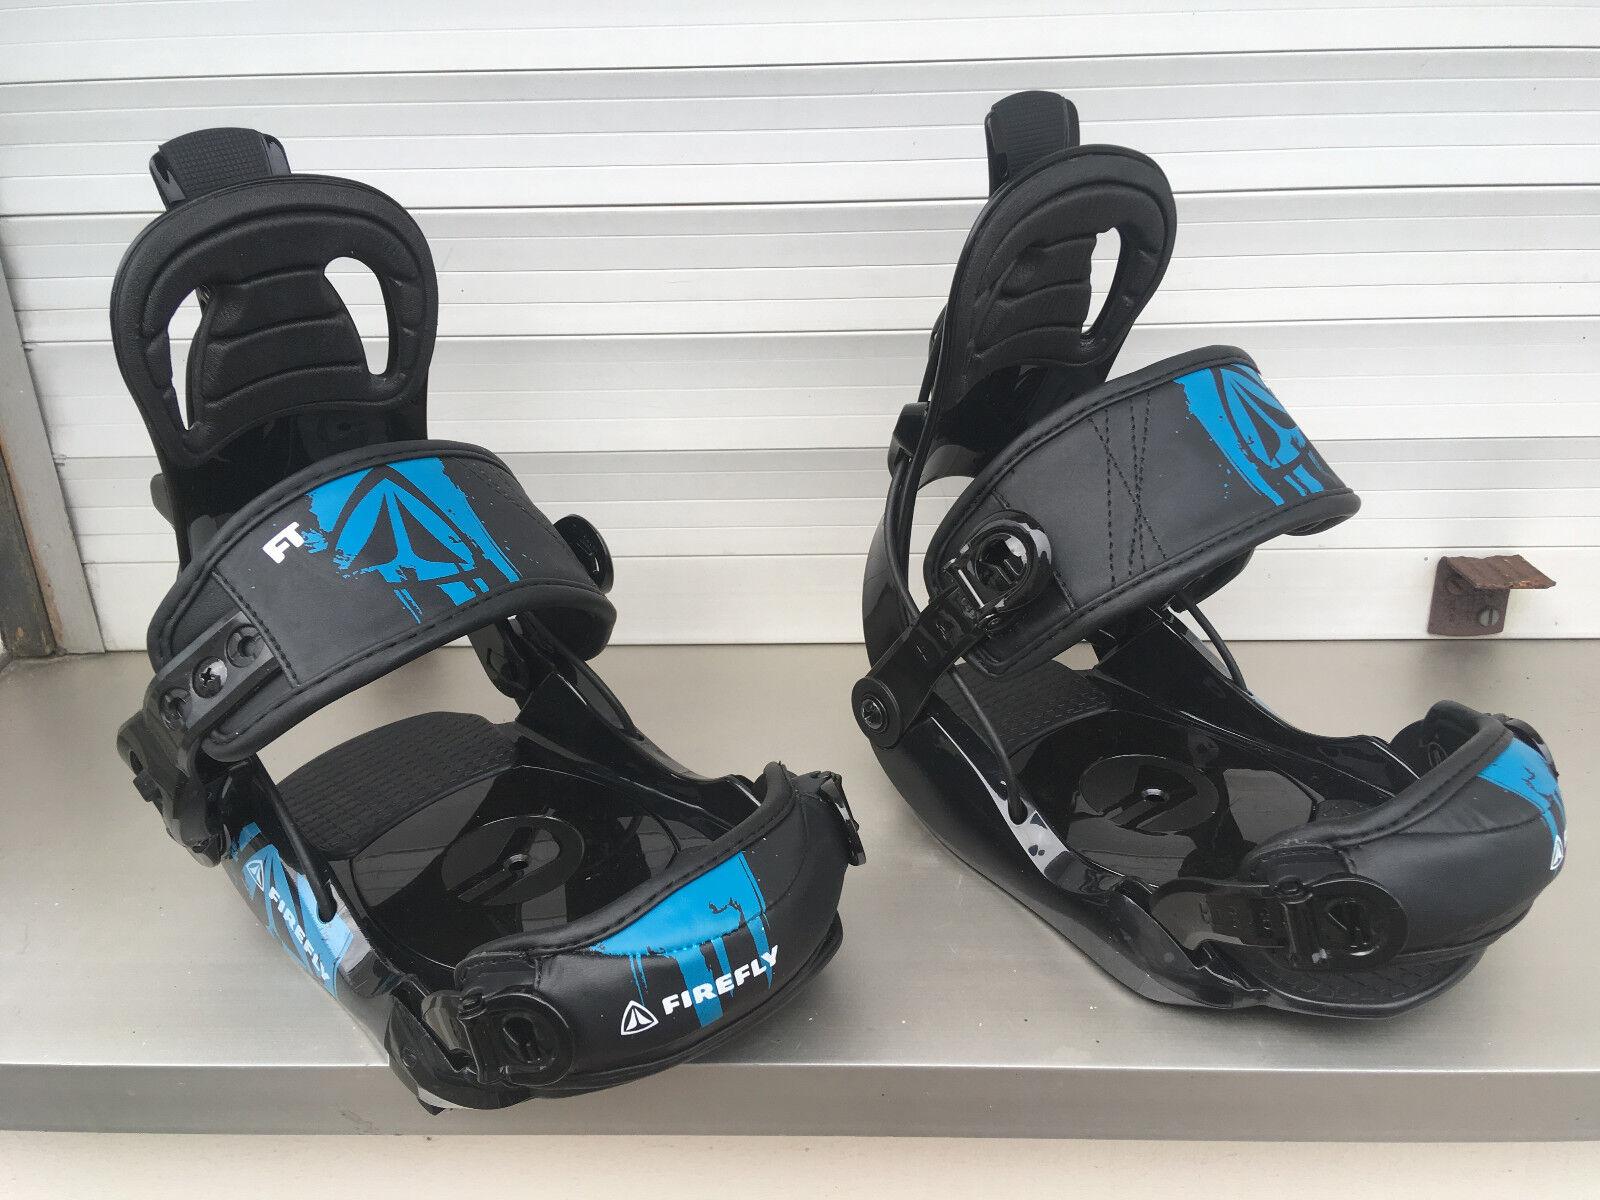 FASTEC Firefly Kinder-Snowboardbindung FT5 kid Soft-Bindung 4x4 Größe S US 6-8